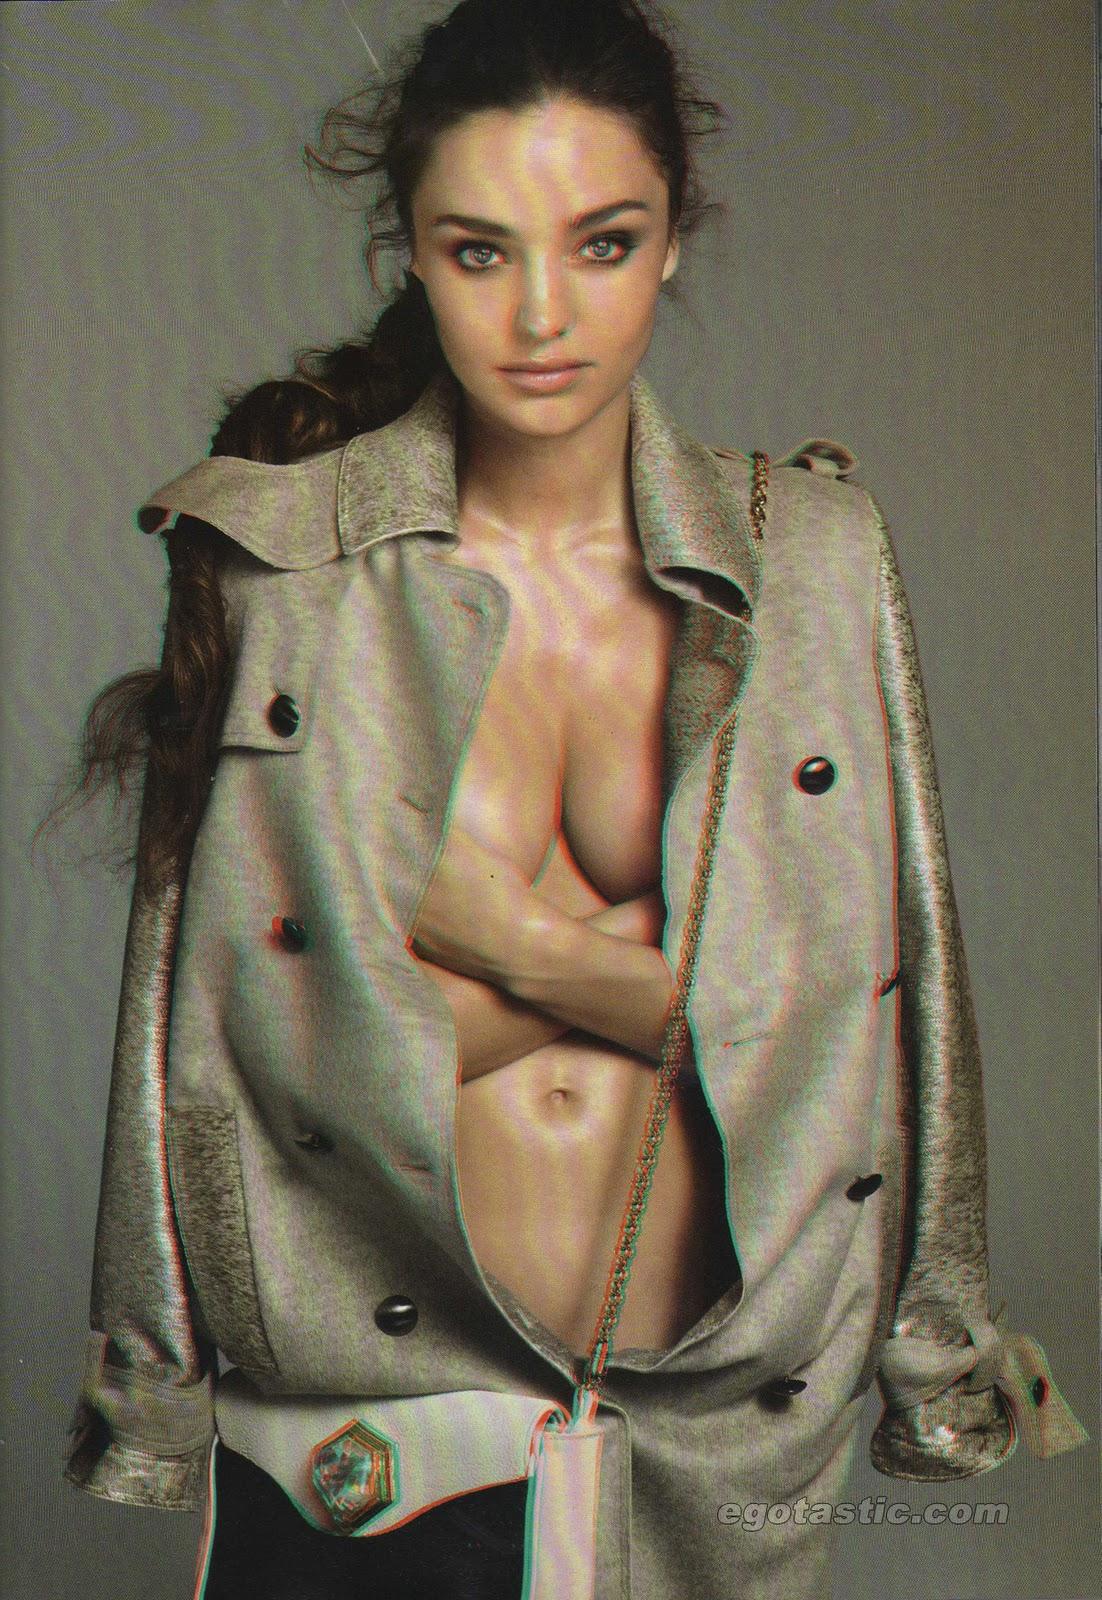 Pretty Naked Lady 96